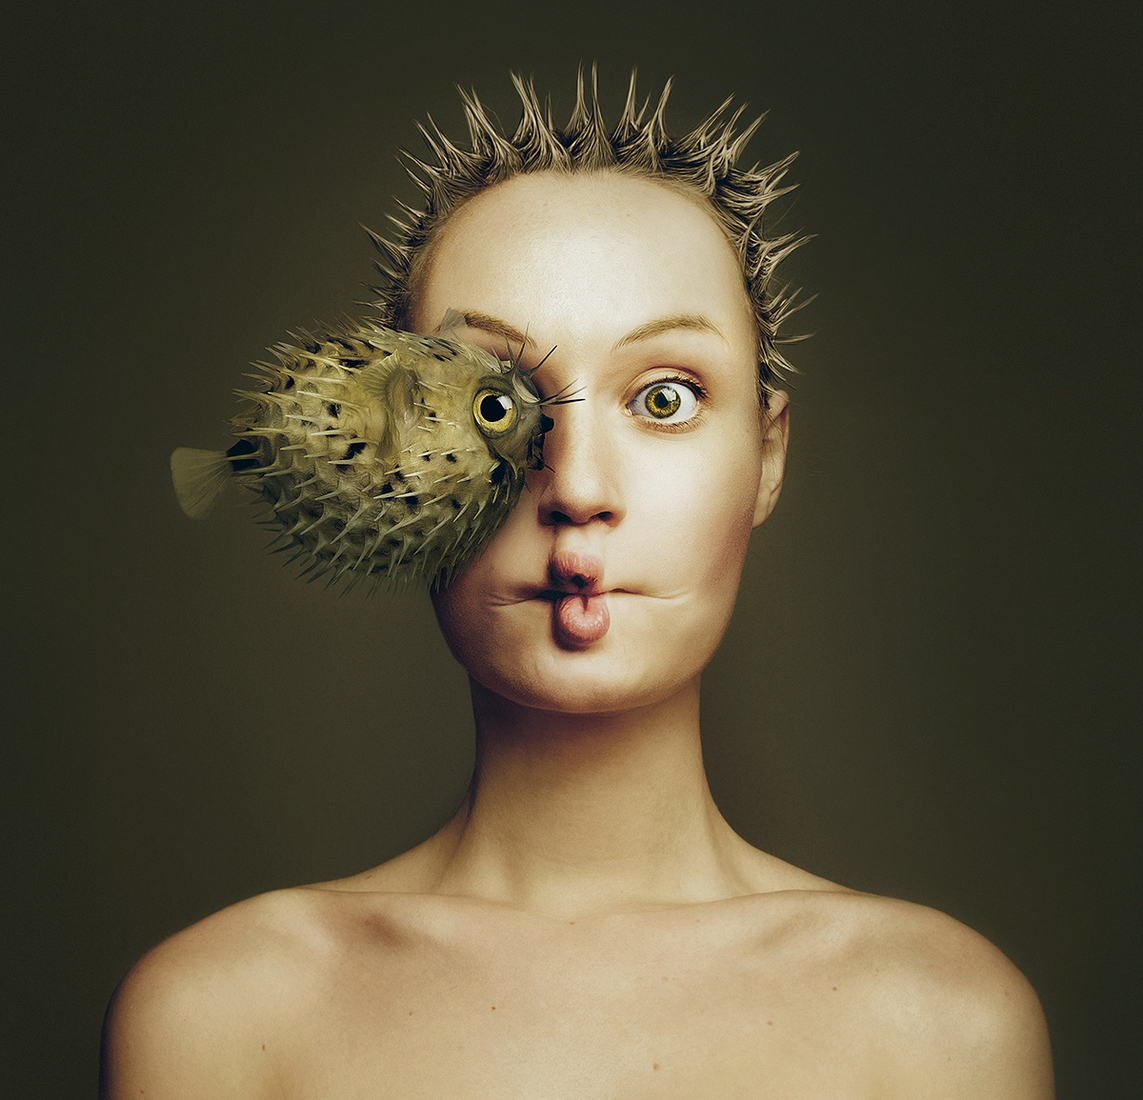 06-Puffer-Fish-Flora-Borsi-Animeyed-Self-Portraits-Surreal-Photographs-www-designstack-co